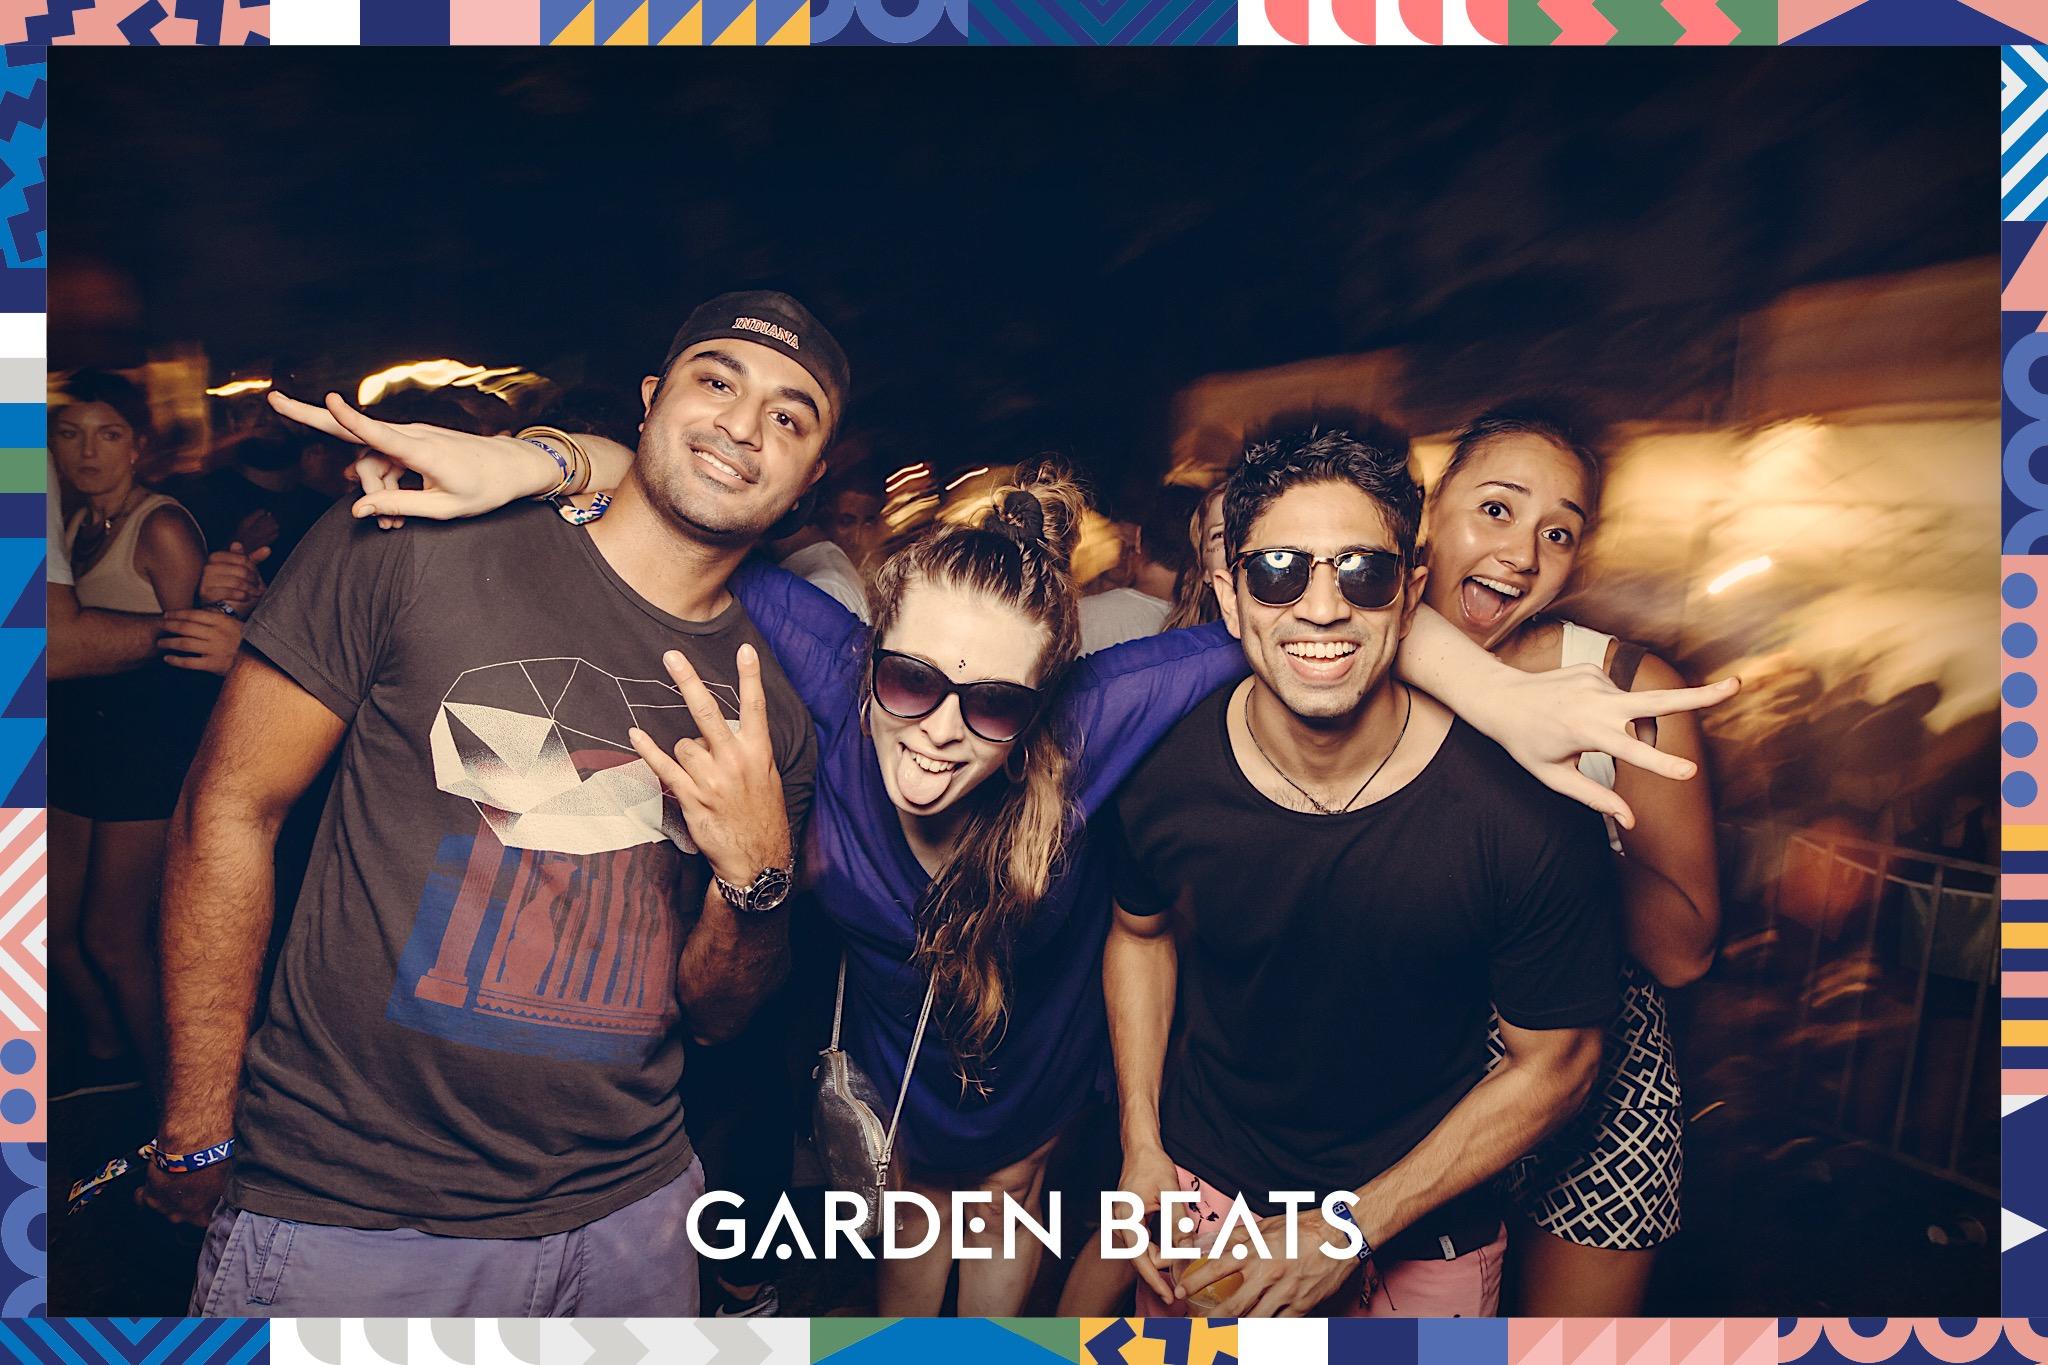 18032017_GardenBeats_Colossal859_WatermarkedGB.jpg